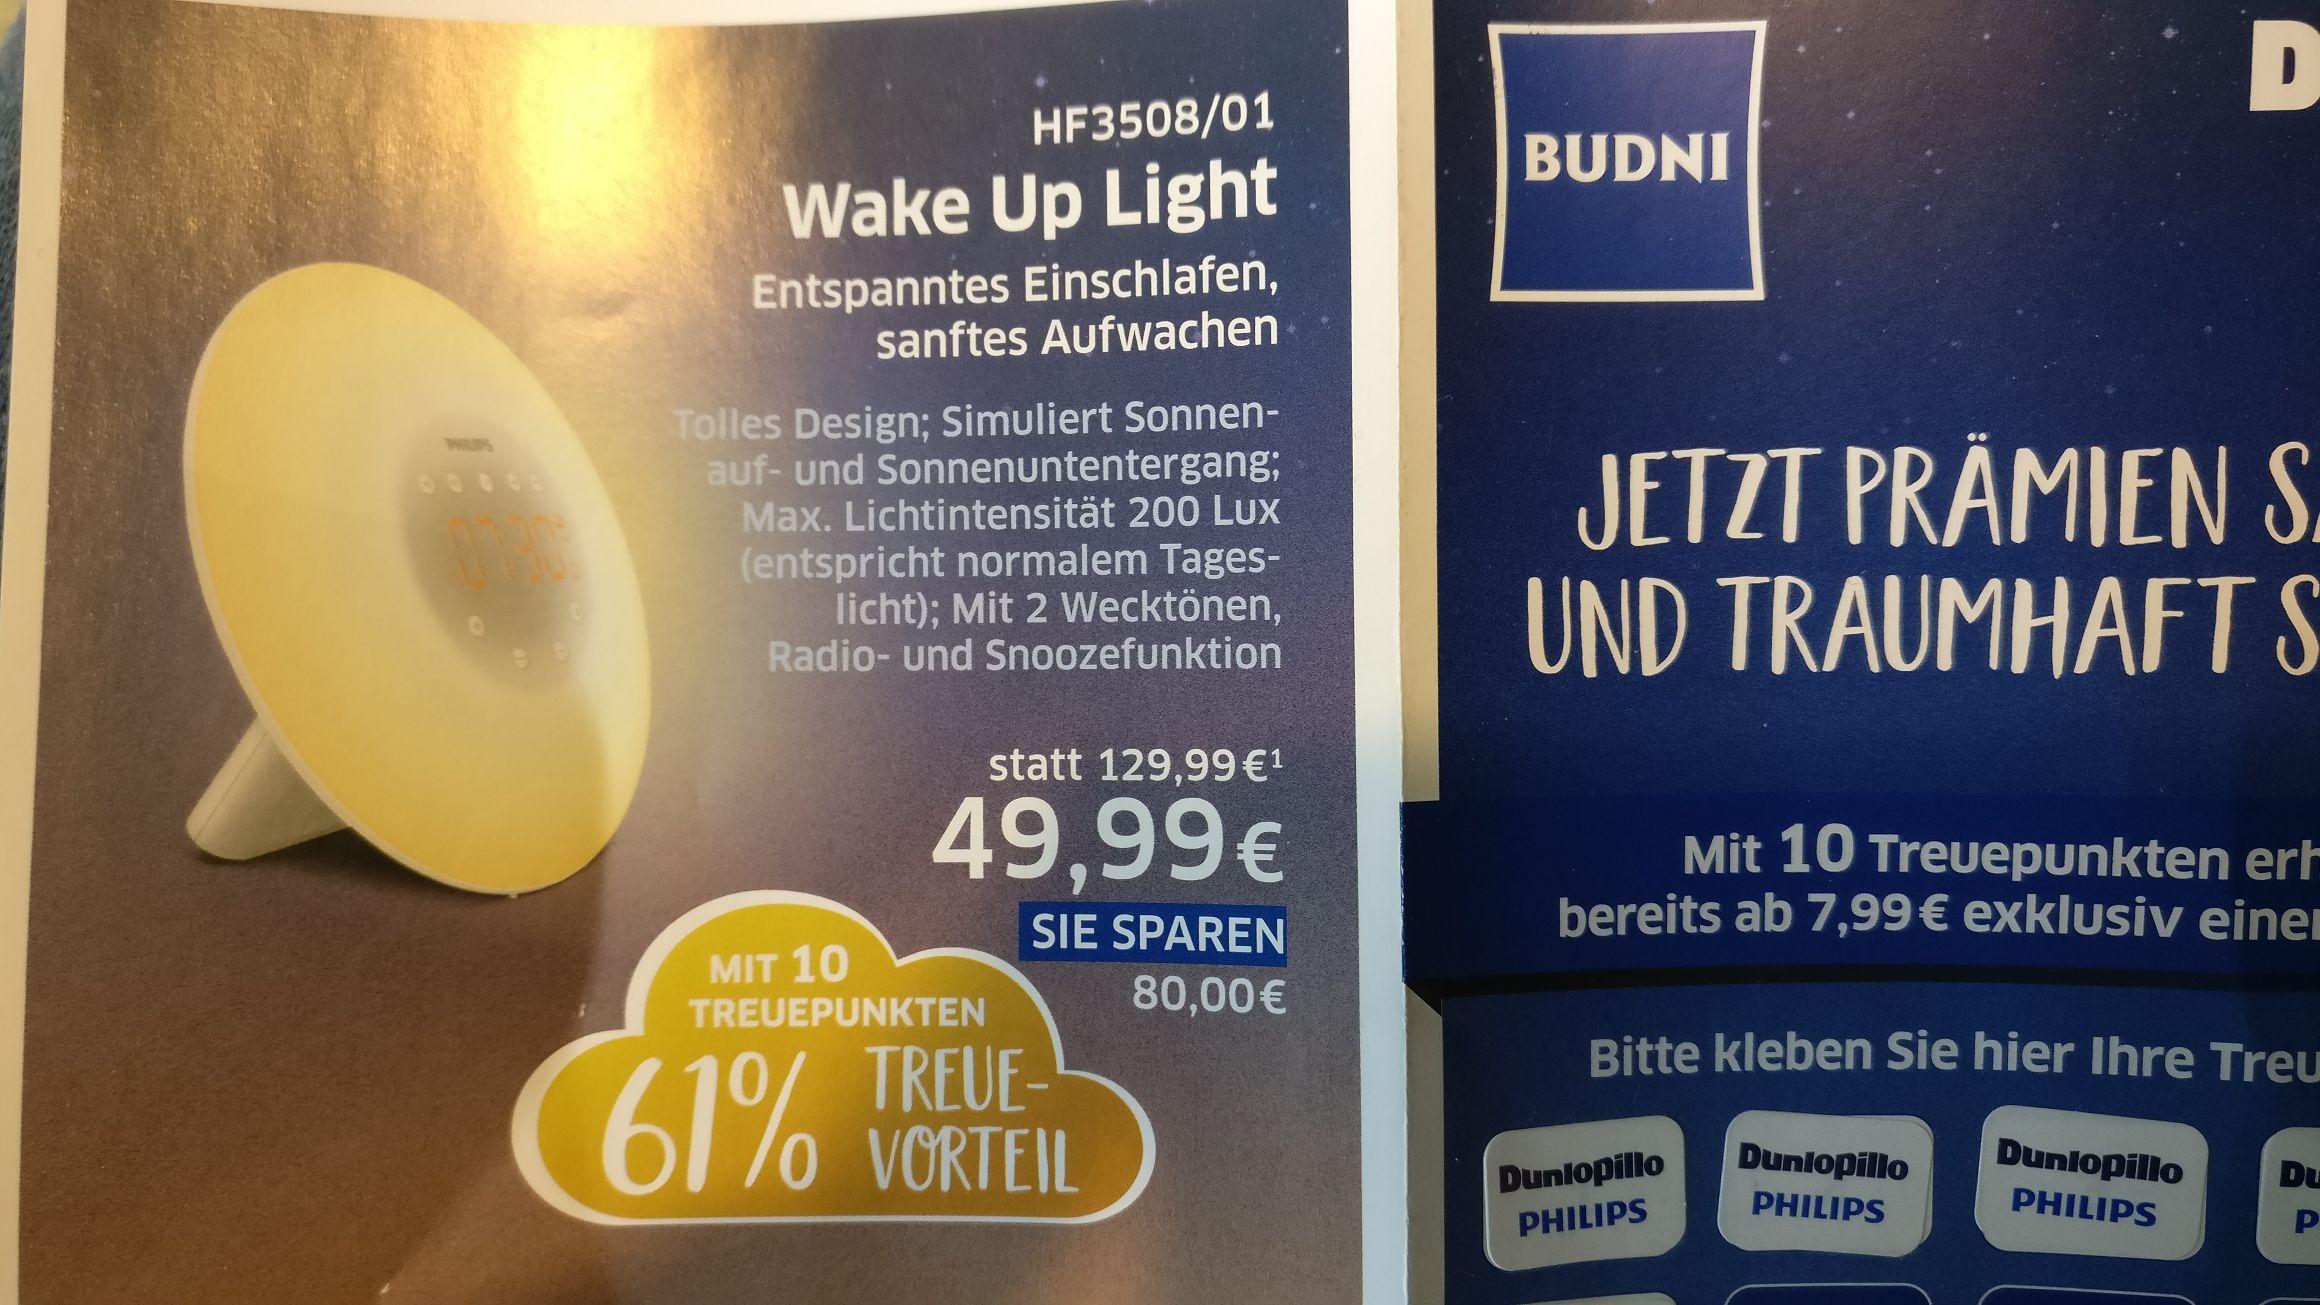 [LOKAL HAMBURG] Phillips wake-up light (HF3508/01)